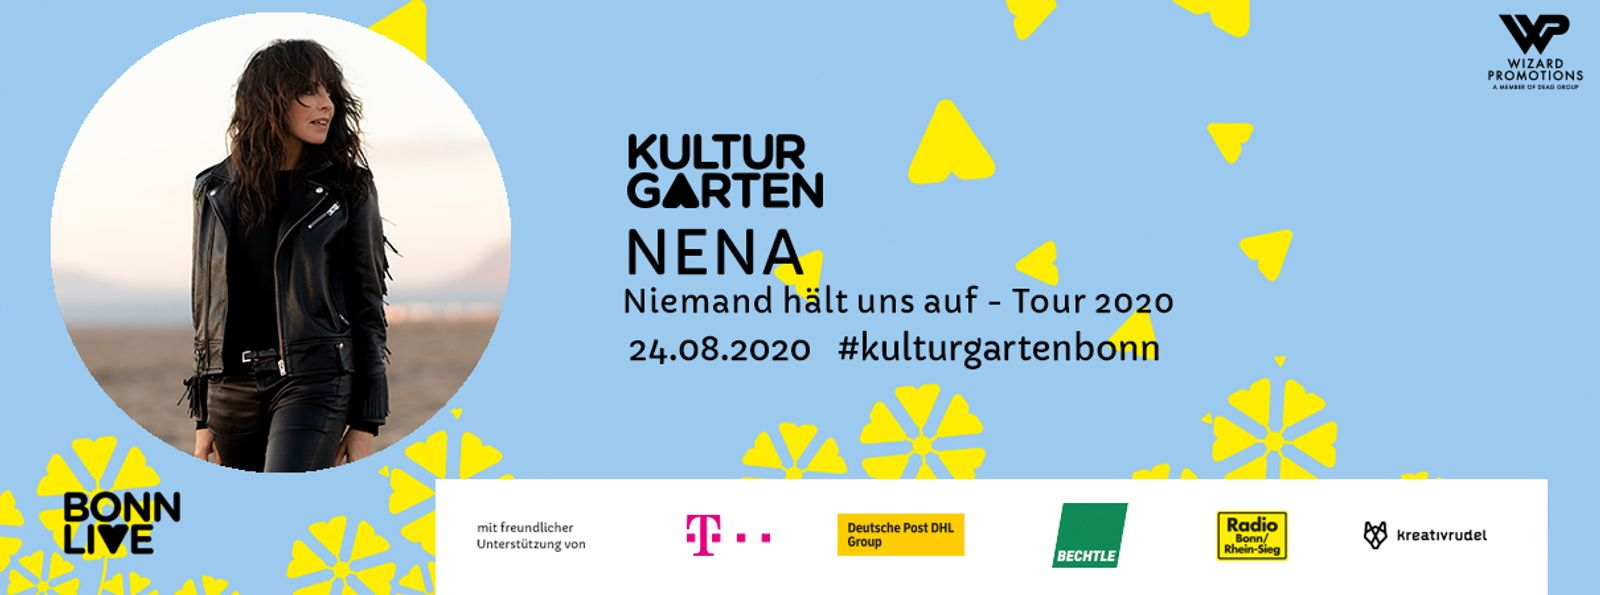 NENA: Niemand hält uns auf- Tour 2020   BonnLive Kulturgarten